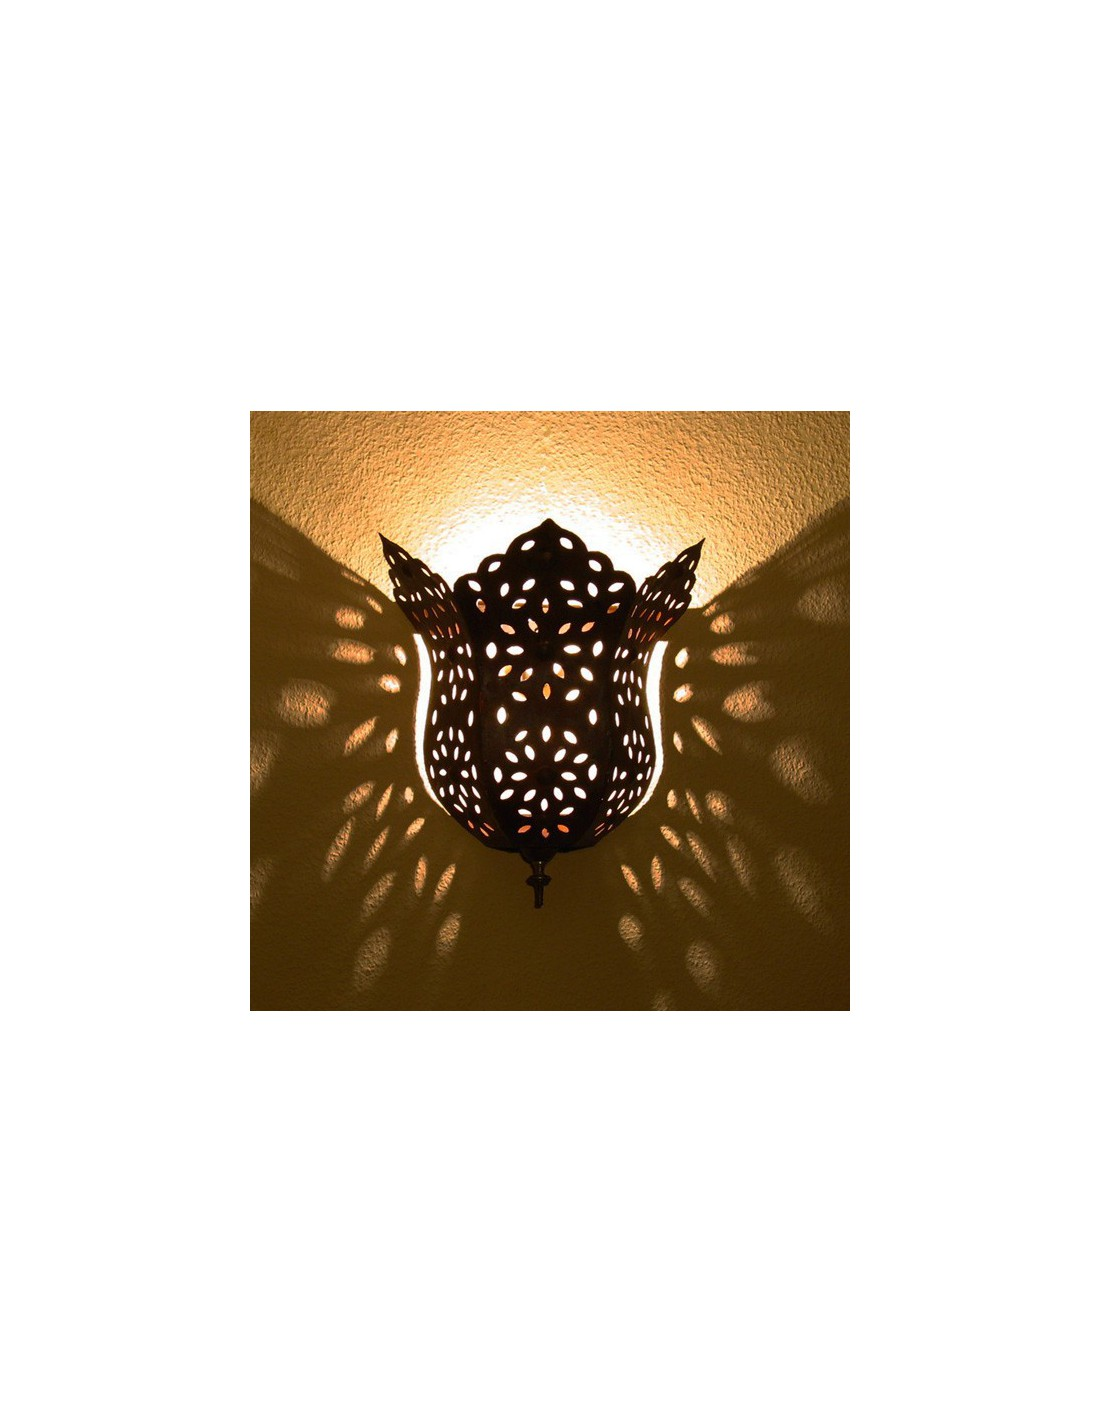 Artisanat marocain, appliques fer forge fait main